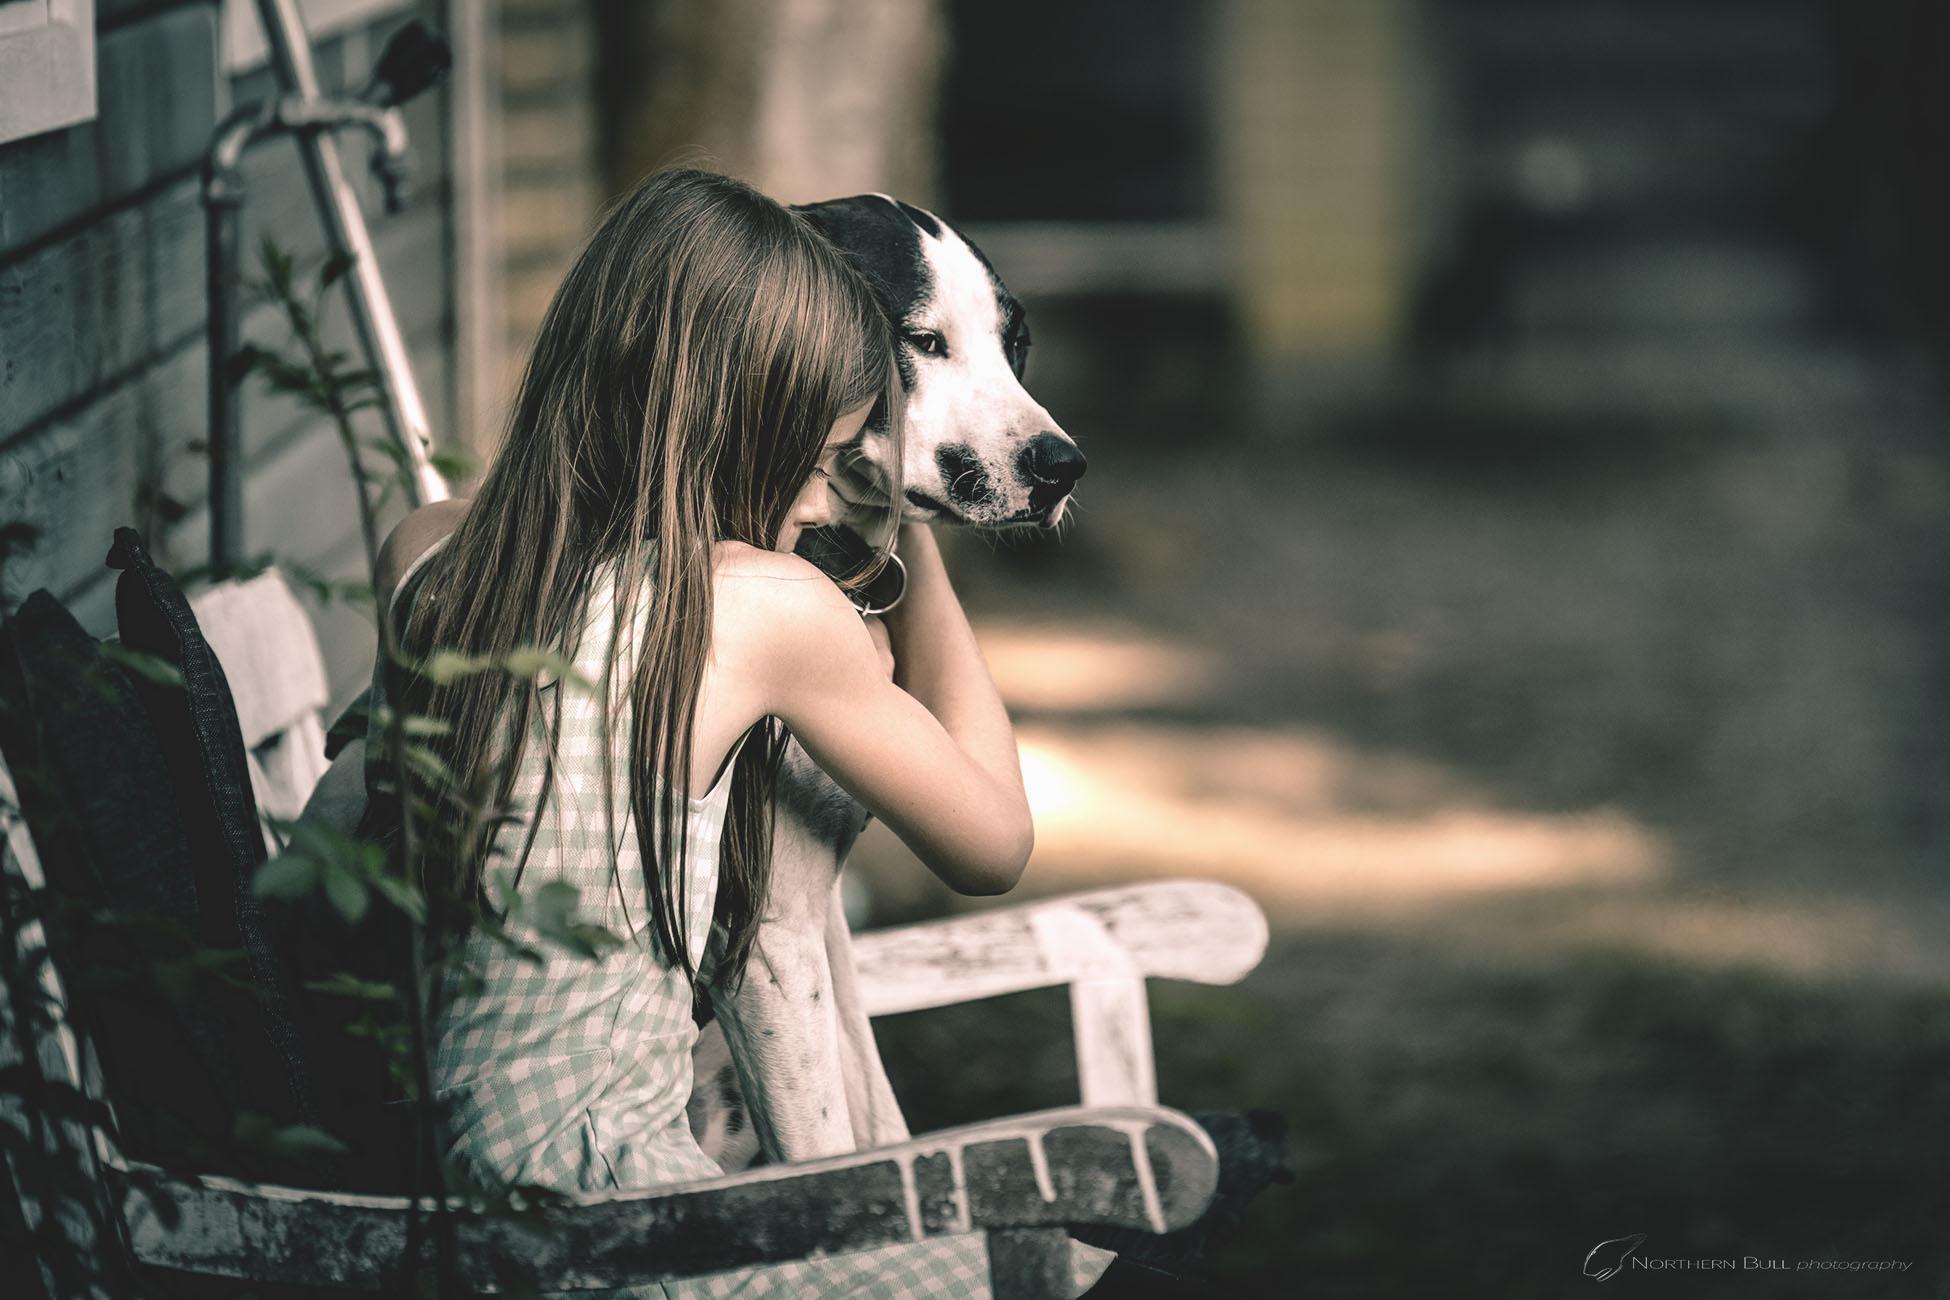 girl_an_dog_by_northern_bull.jpg